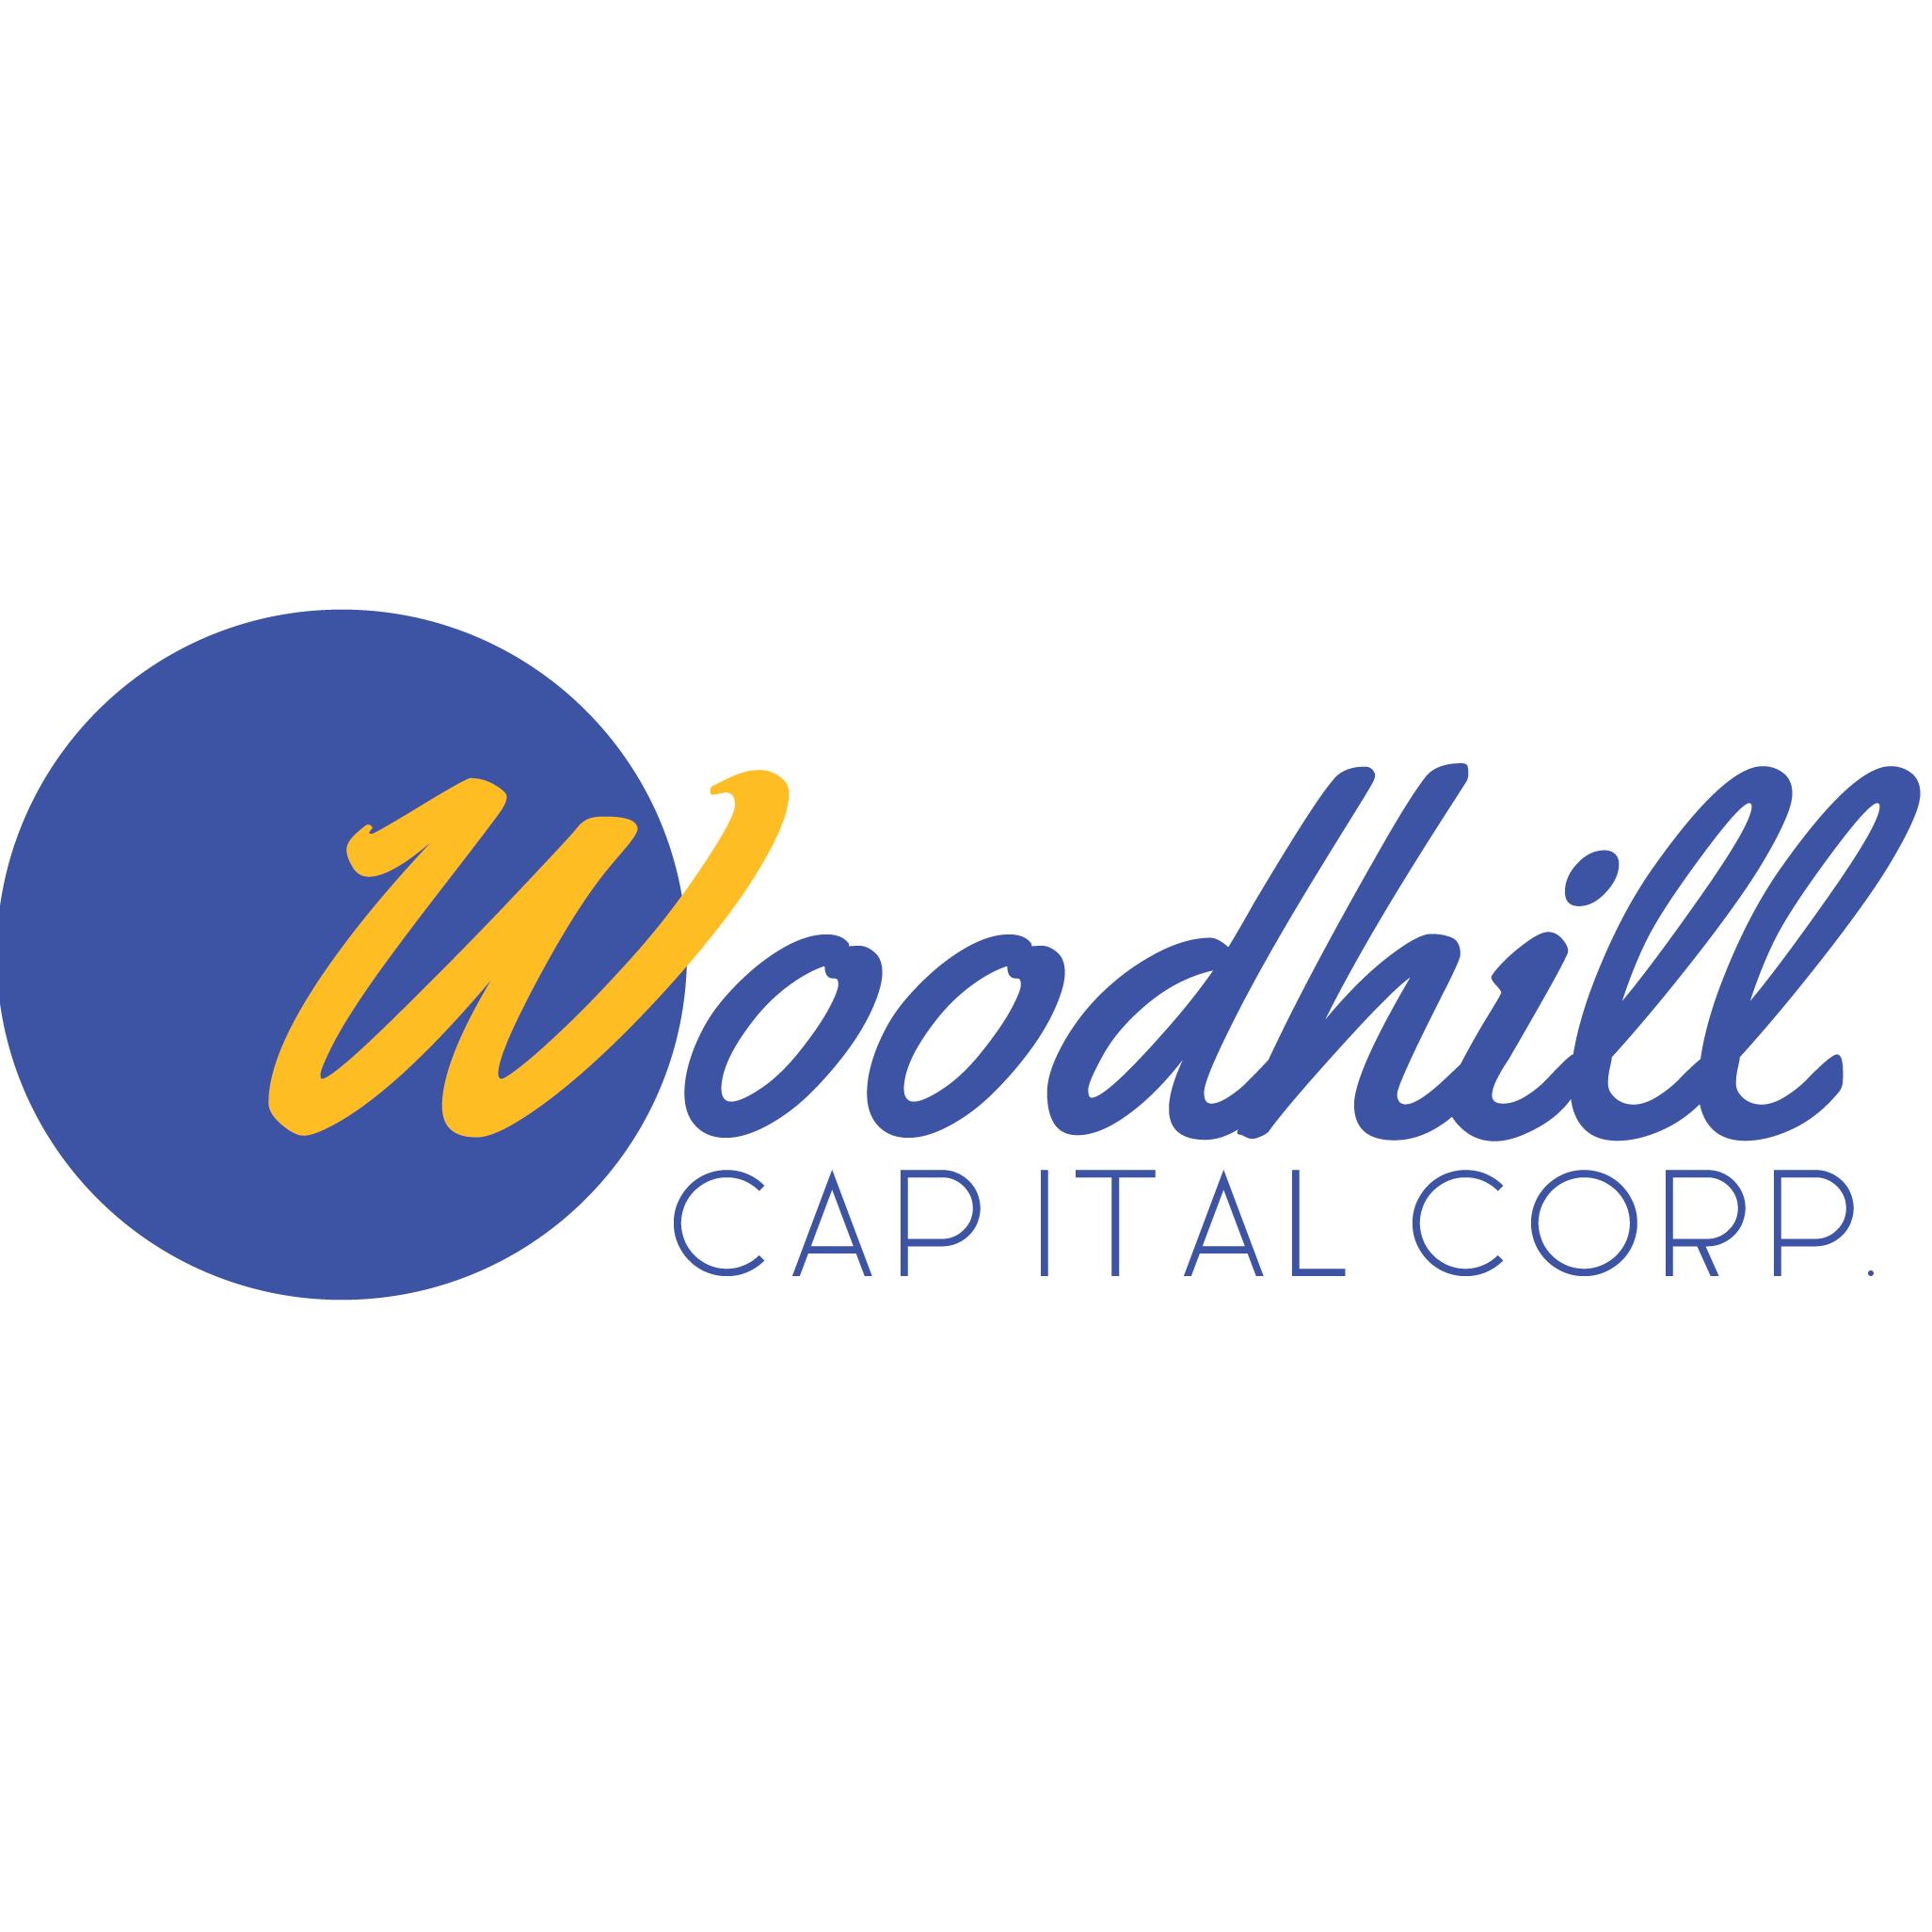 Woodhill Capital Corp image 2